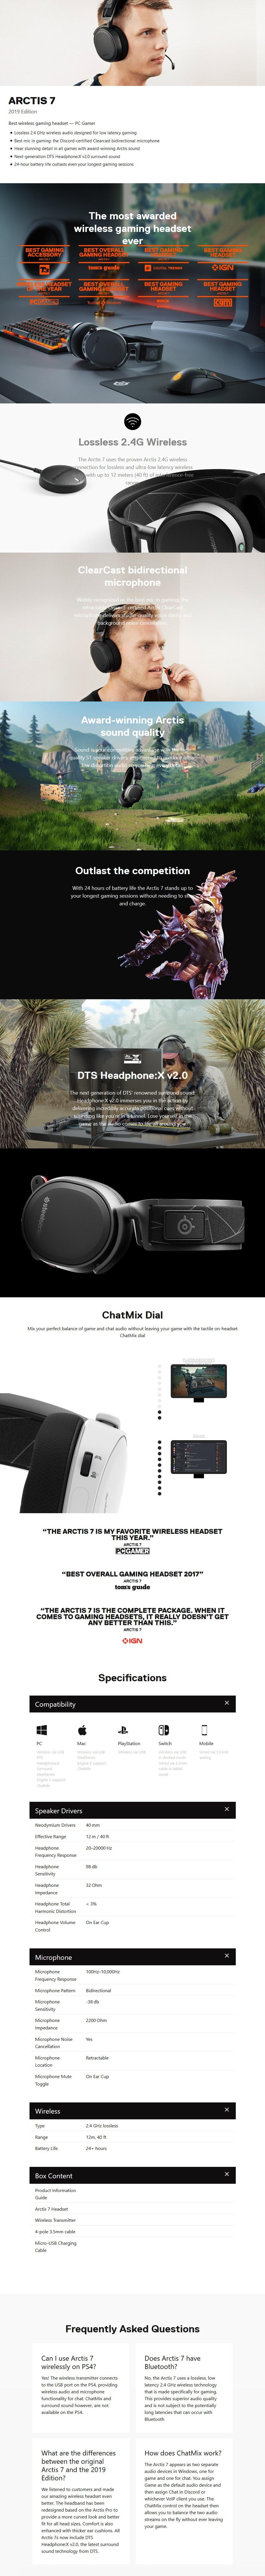 SteelSeries Arctis 7 Wireless Gaming Headset 2018 Edition - Black - Desktop Overview 1